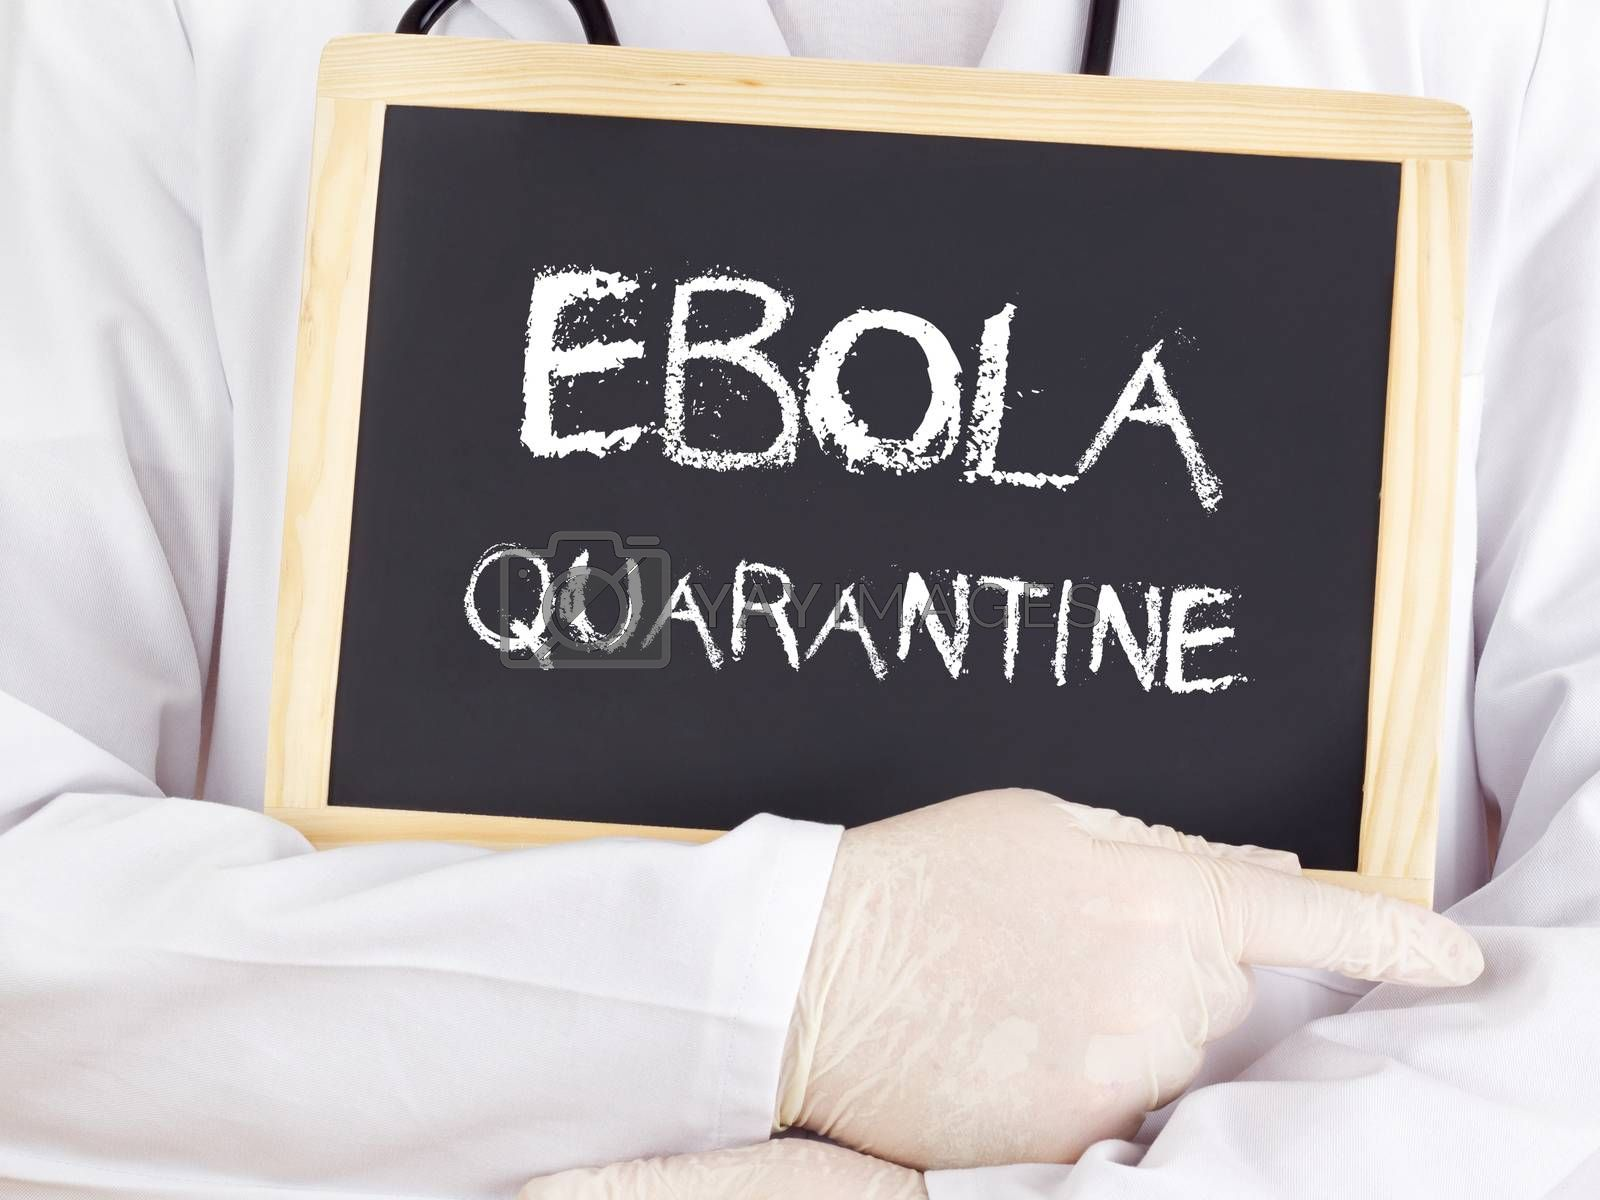 Doctor shows information: Ebola quarantine